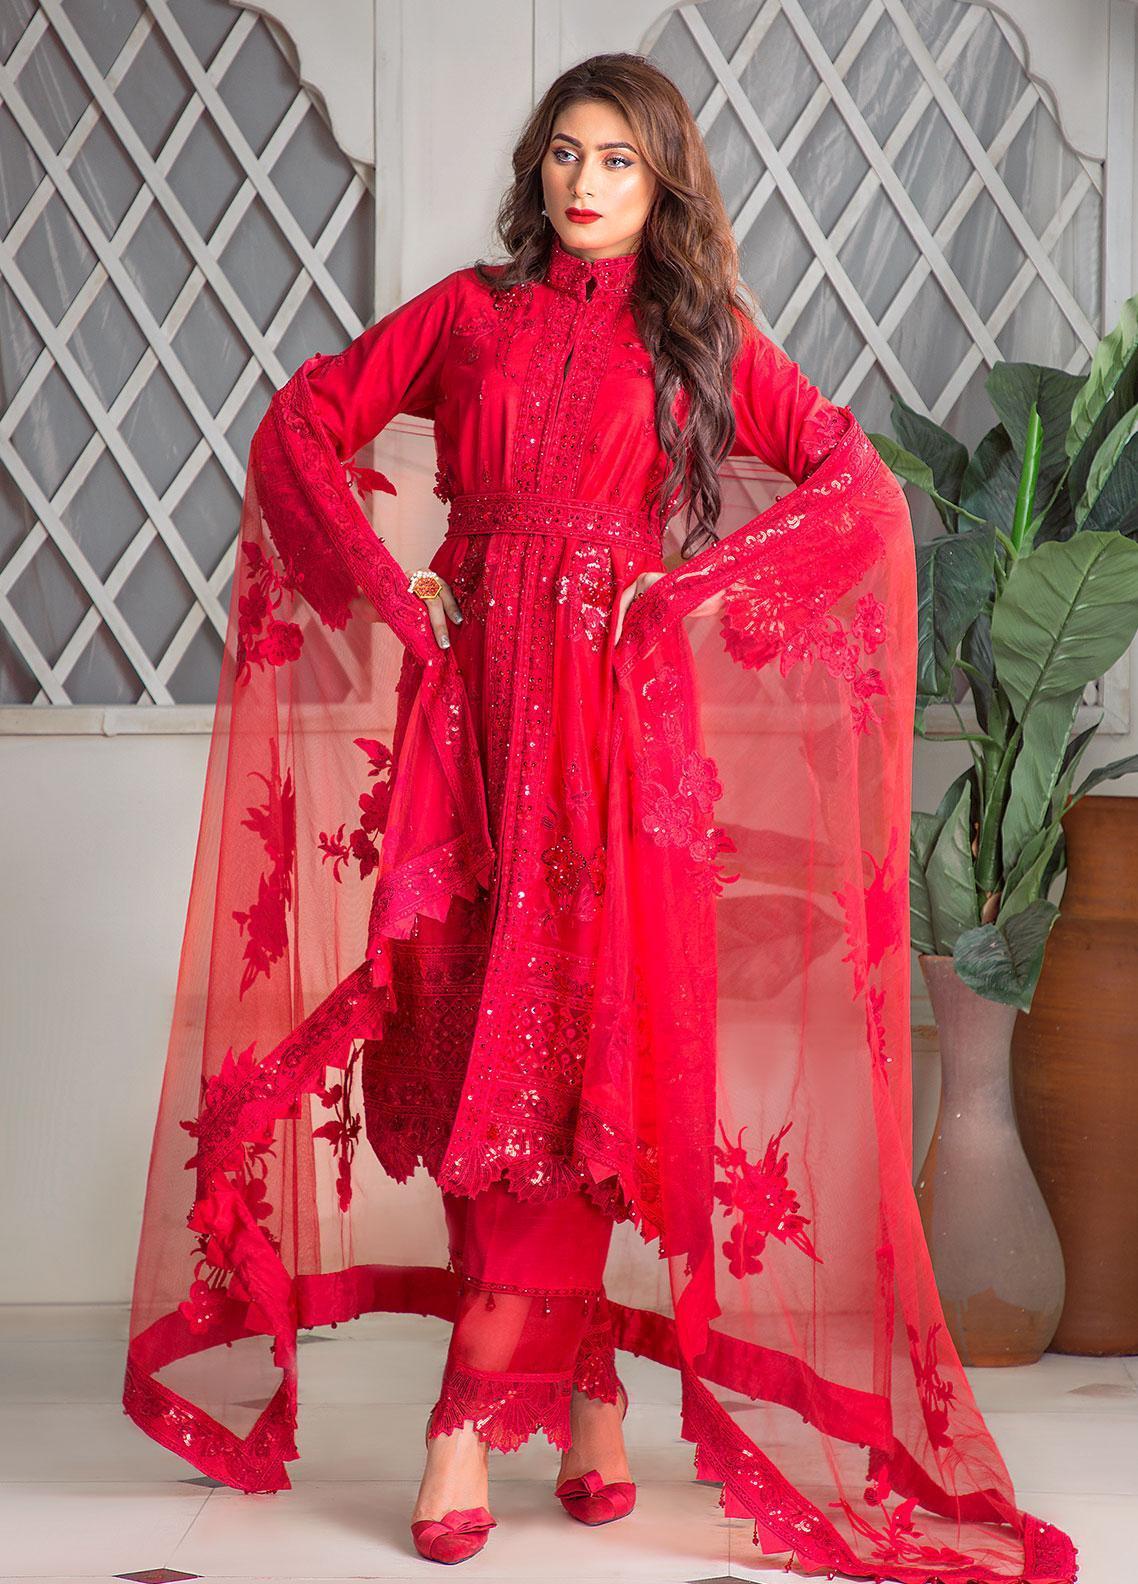 Surmai Luxury Pret Embroidered Net 3 Piece Dress SLP-07